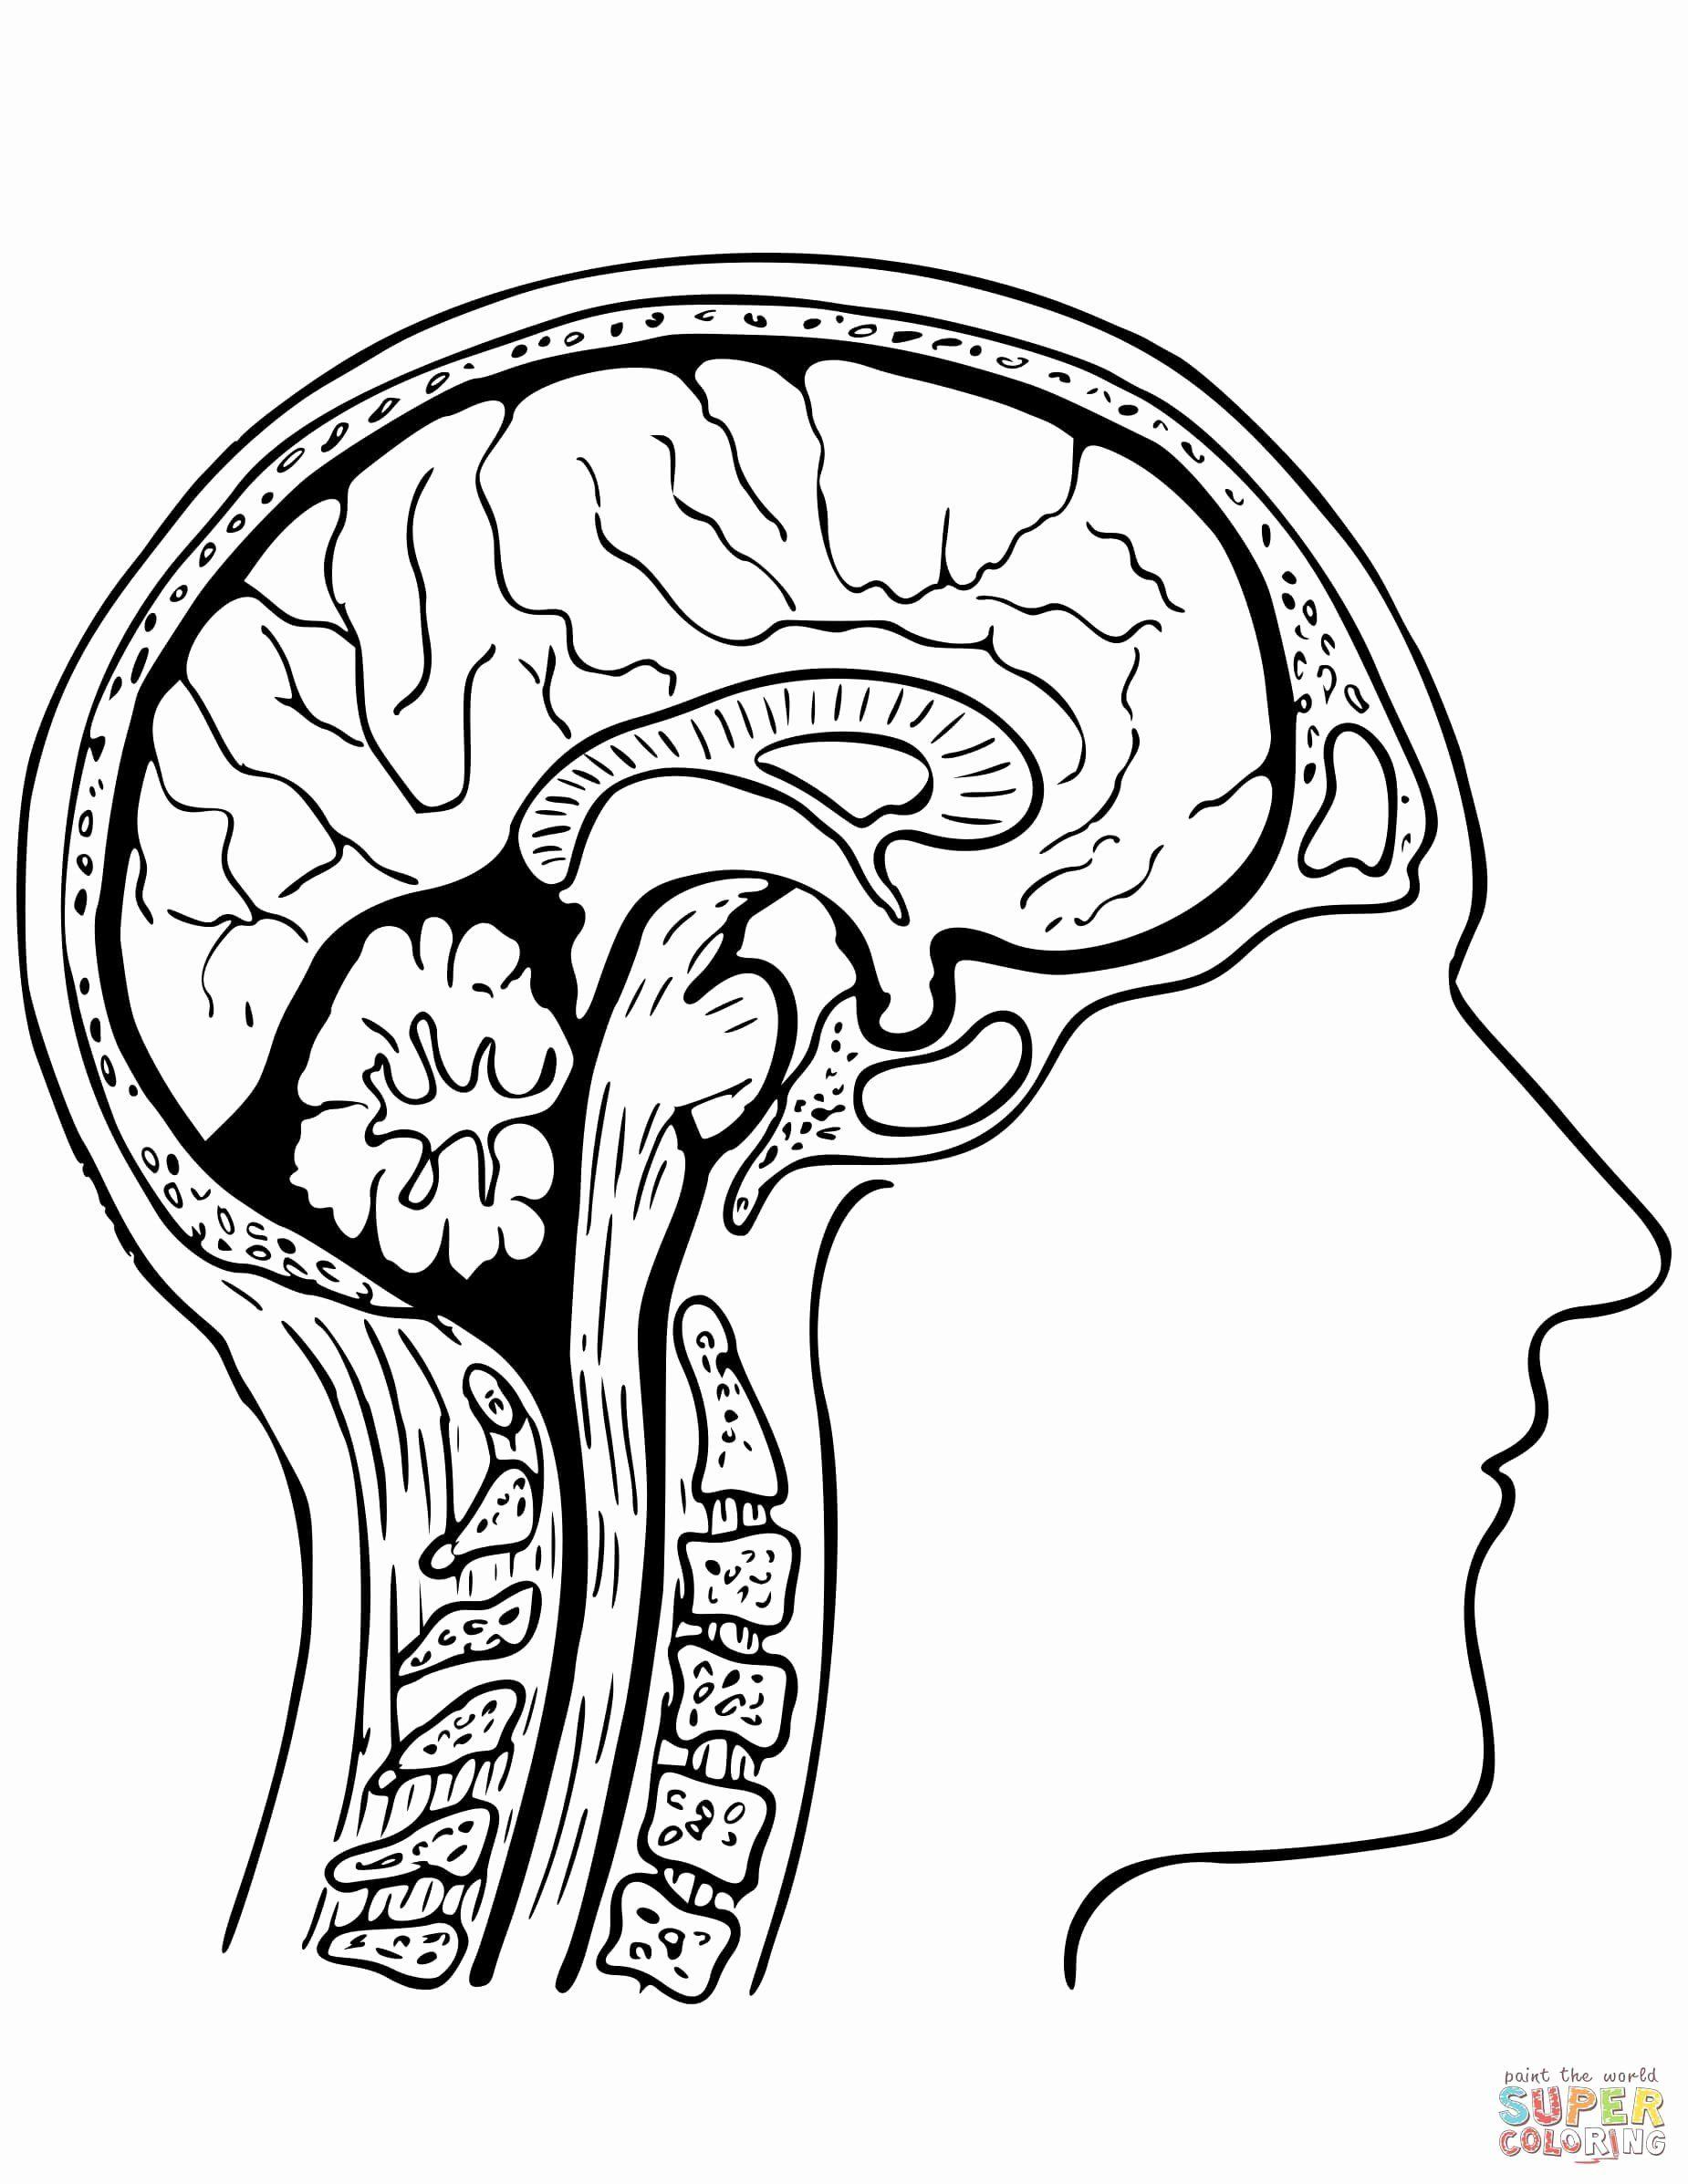 Human Brain Coloring Book Elegant 28 Human Brain Coloring Book In 2020 Coloring Books Coloring Pages Coloring Book Pages